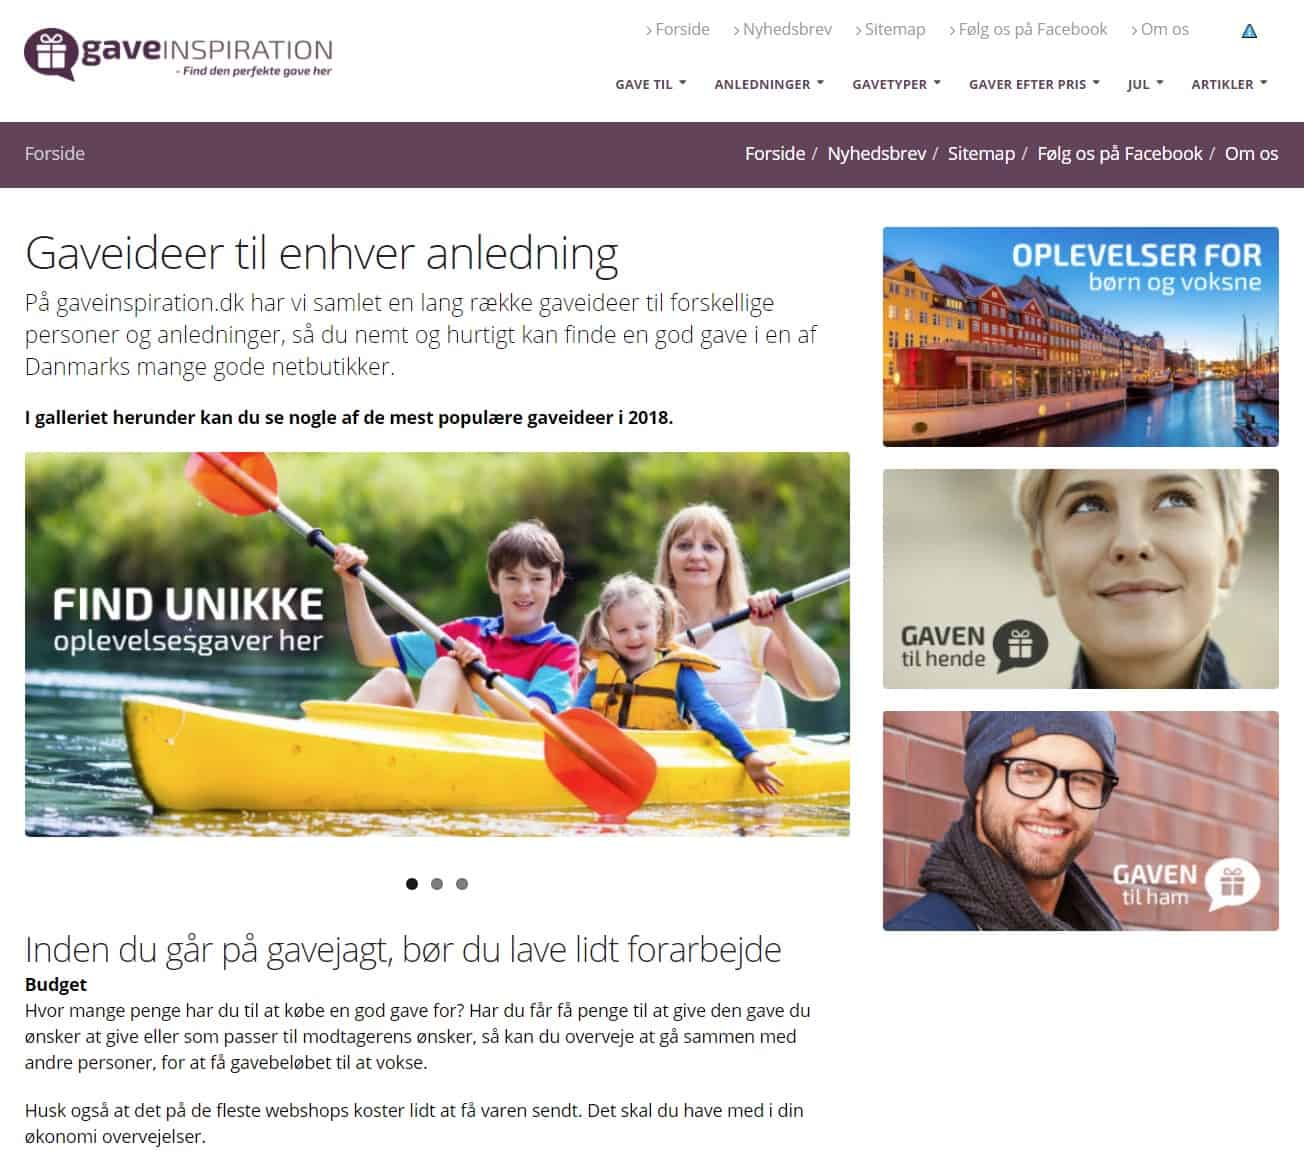 Gaveinspiration.dk